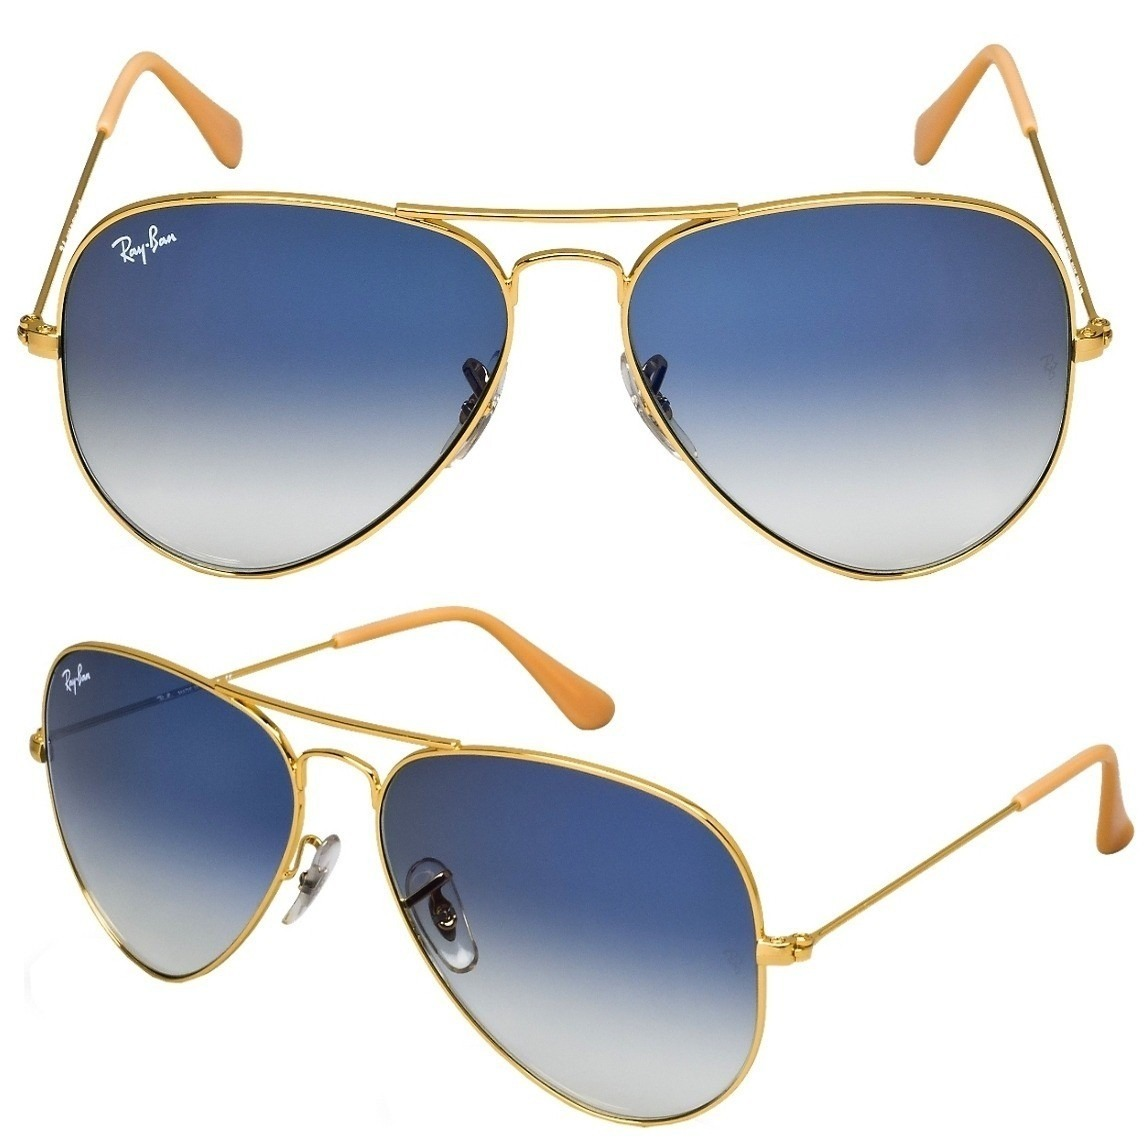 76b4a3fd0 oculos de sol feminino ray ban mercado livre | ALPHATIER